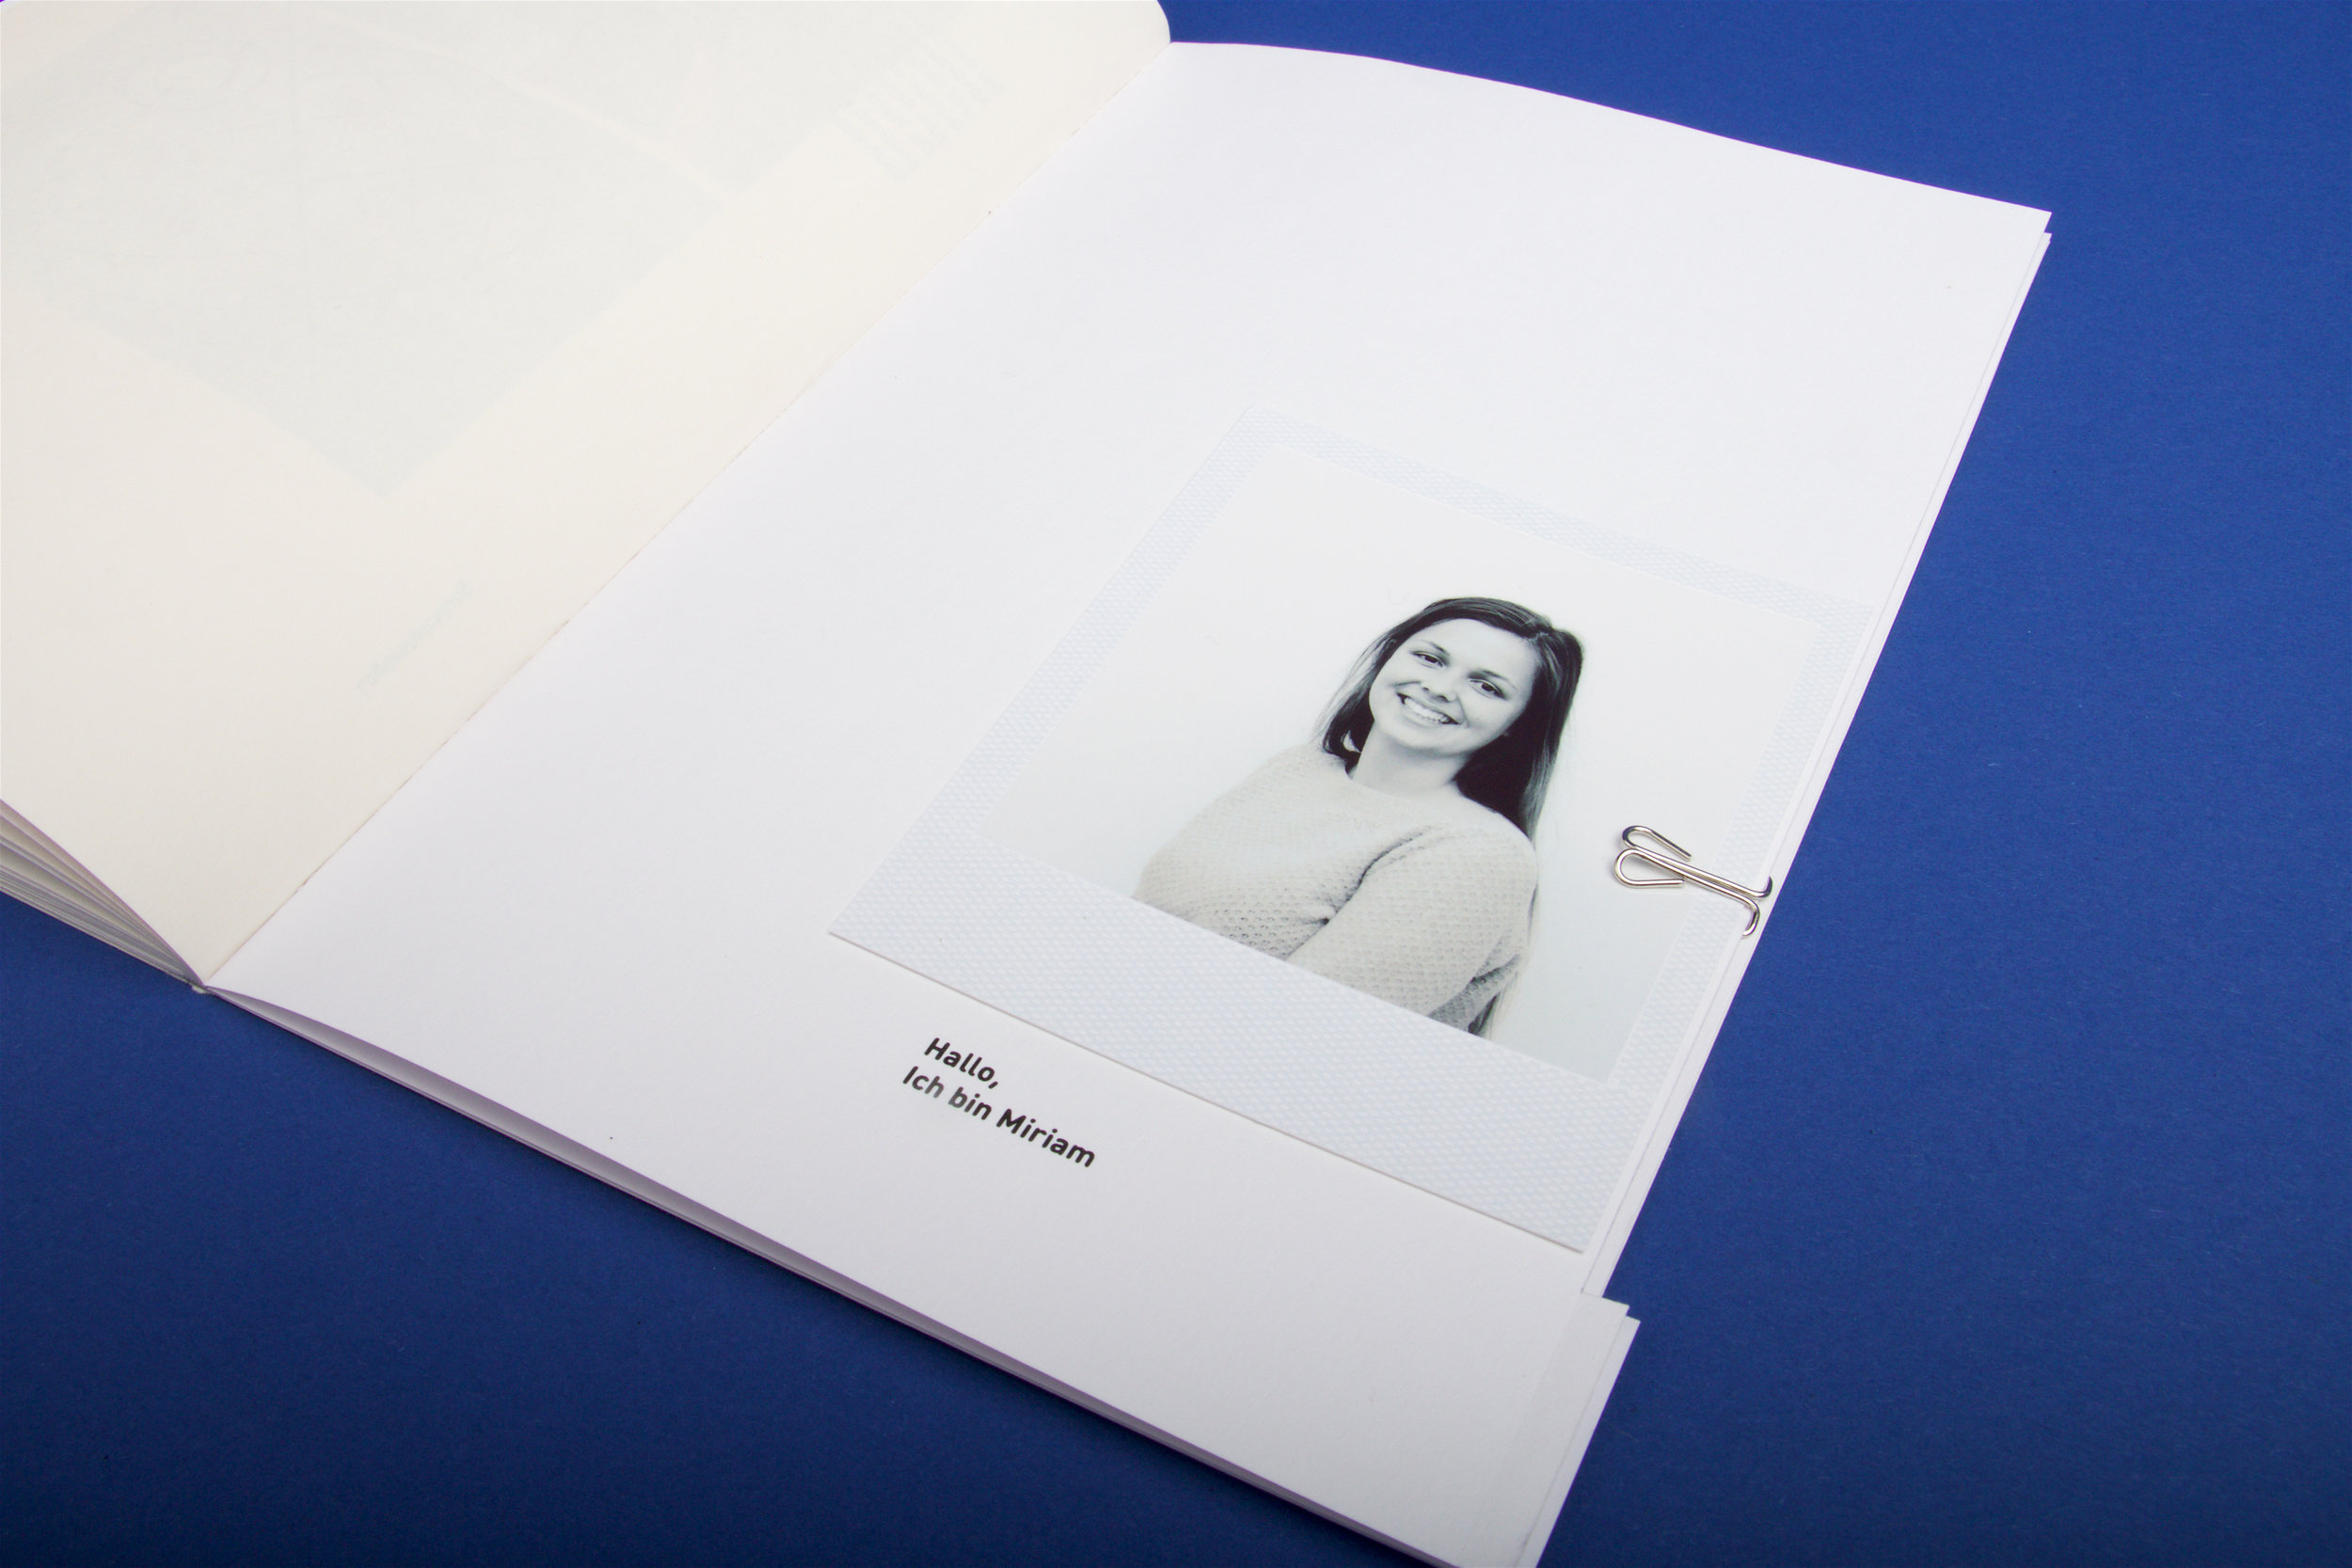 cv//polaroid